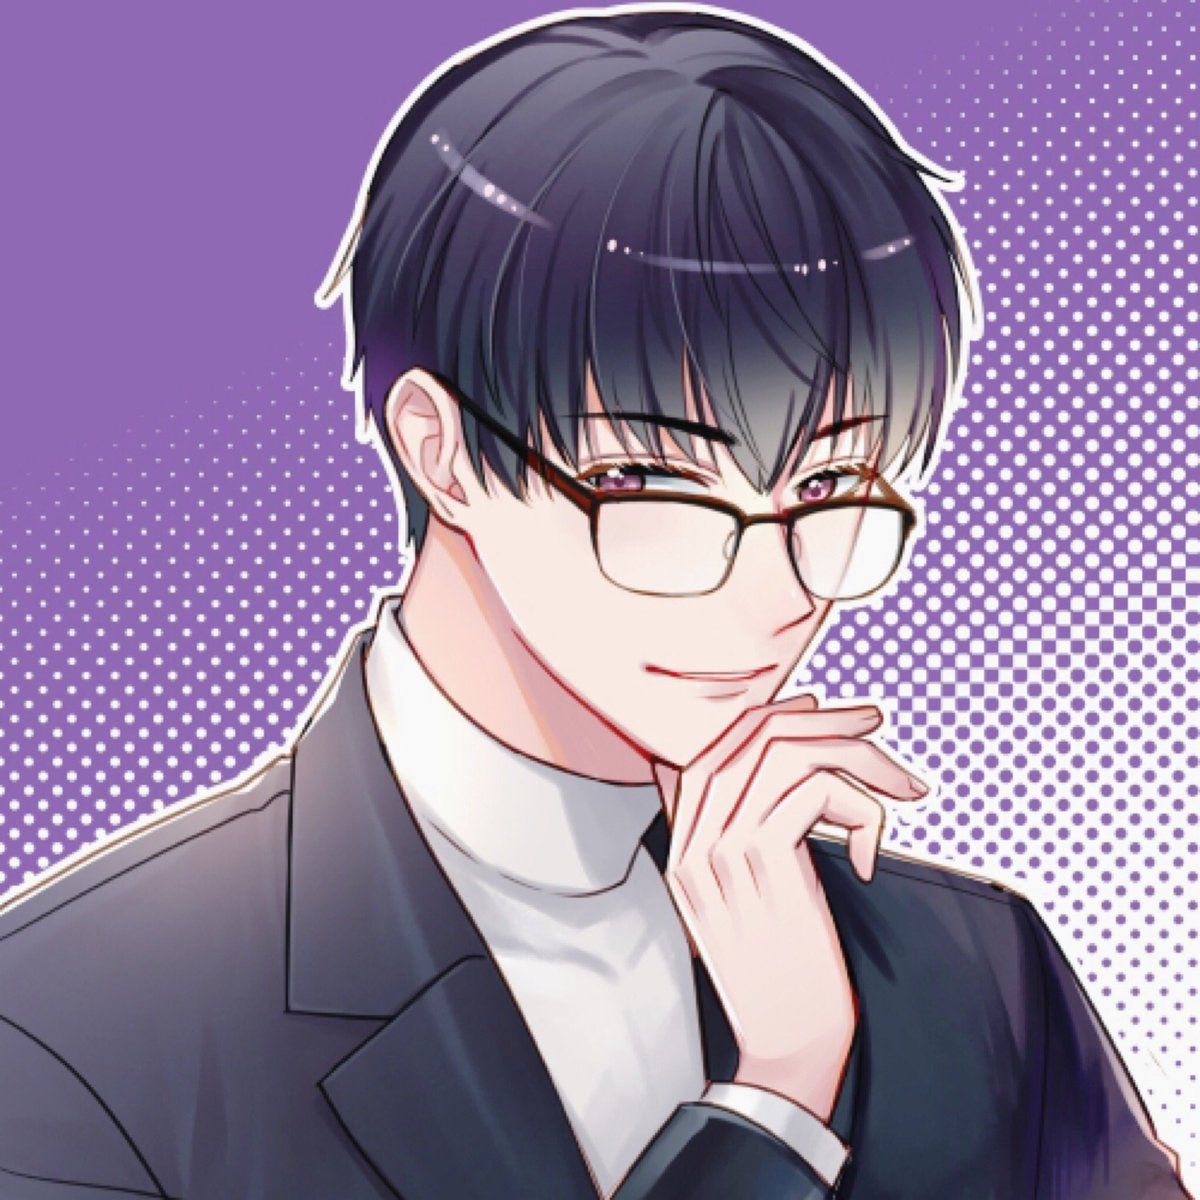 海老牛蒡卷 on Twitter in 2020 Netflix anime, Dream date